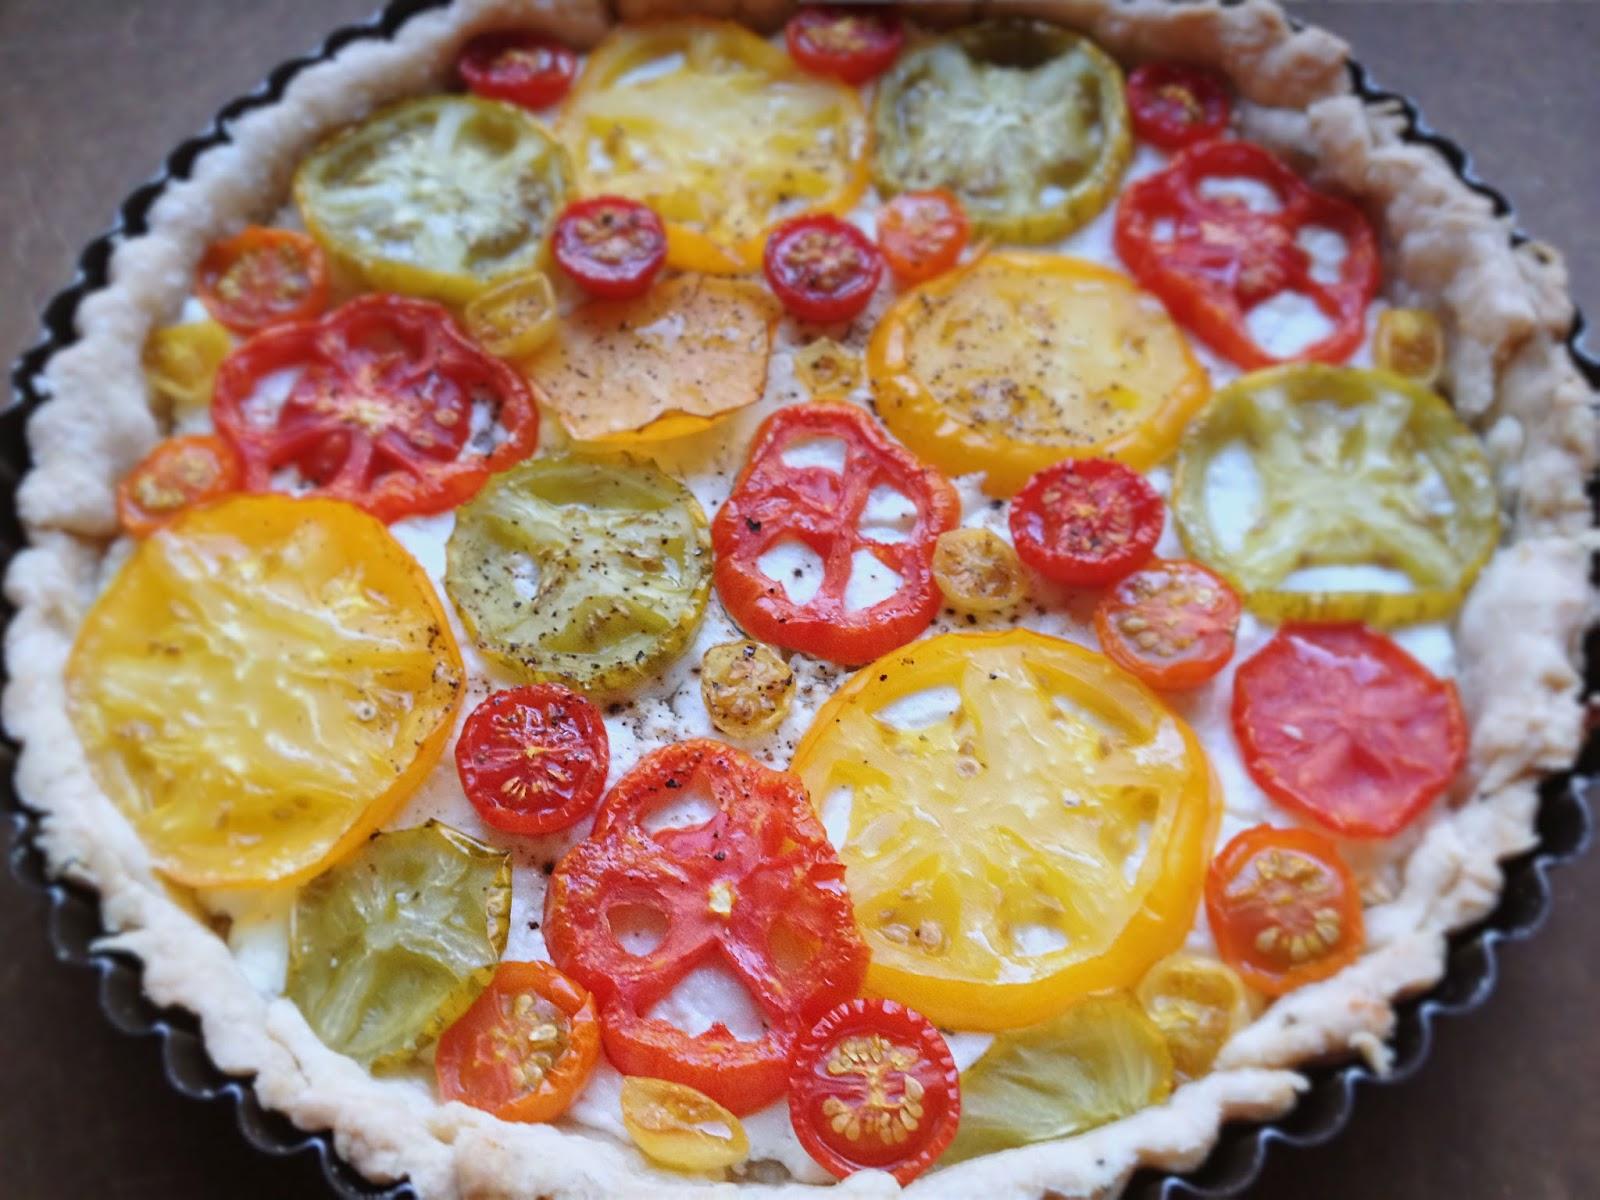 Tomato Tart With Parmesan-Rosemary Crust